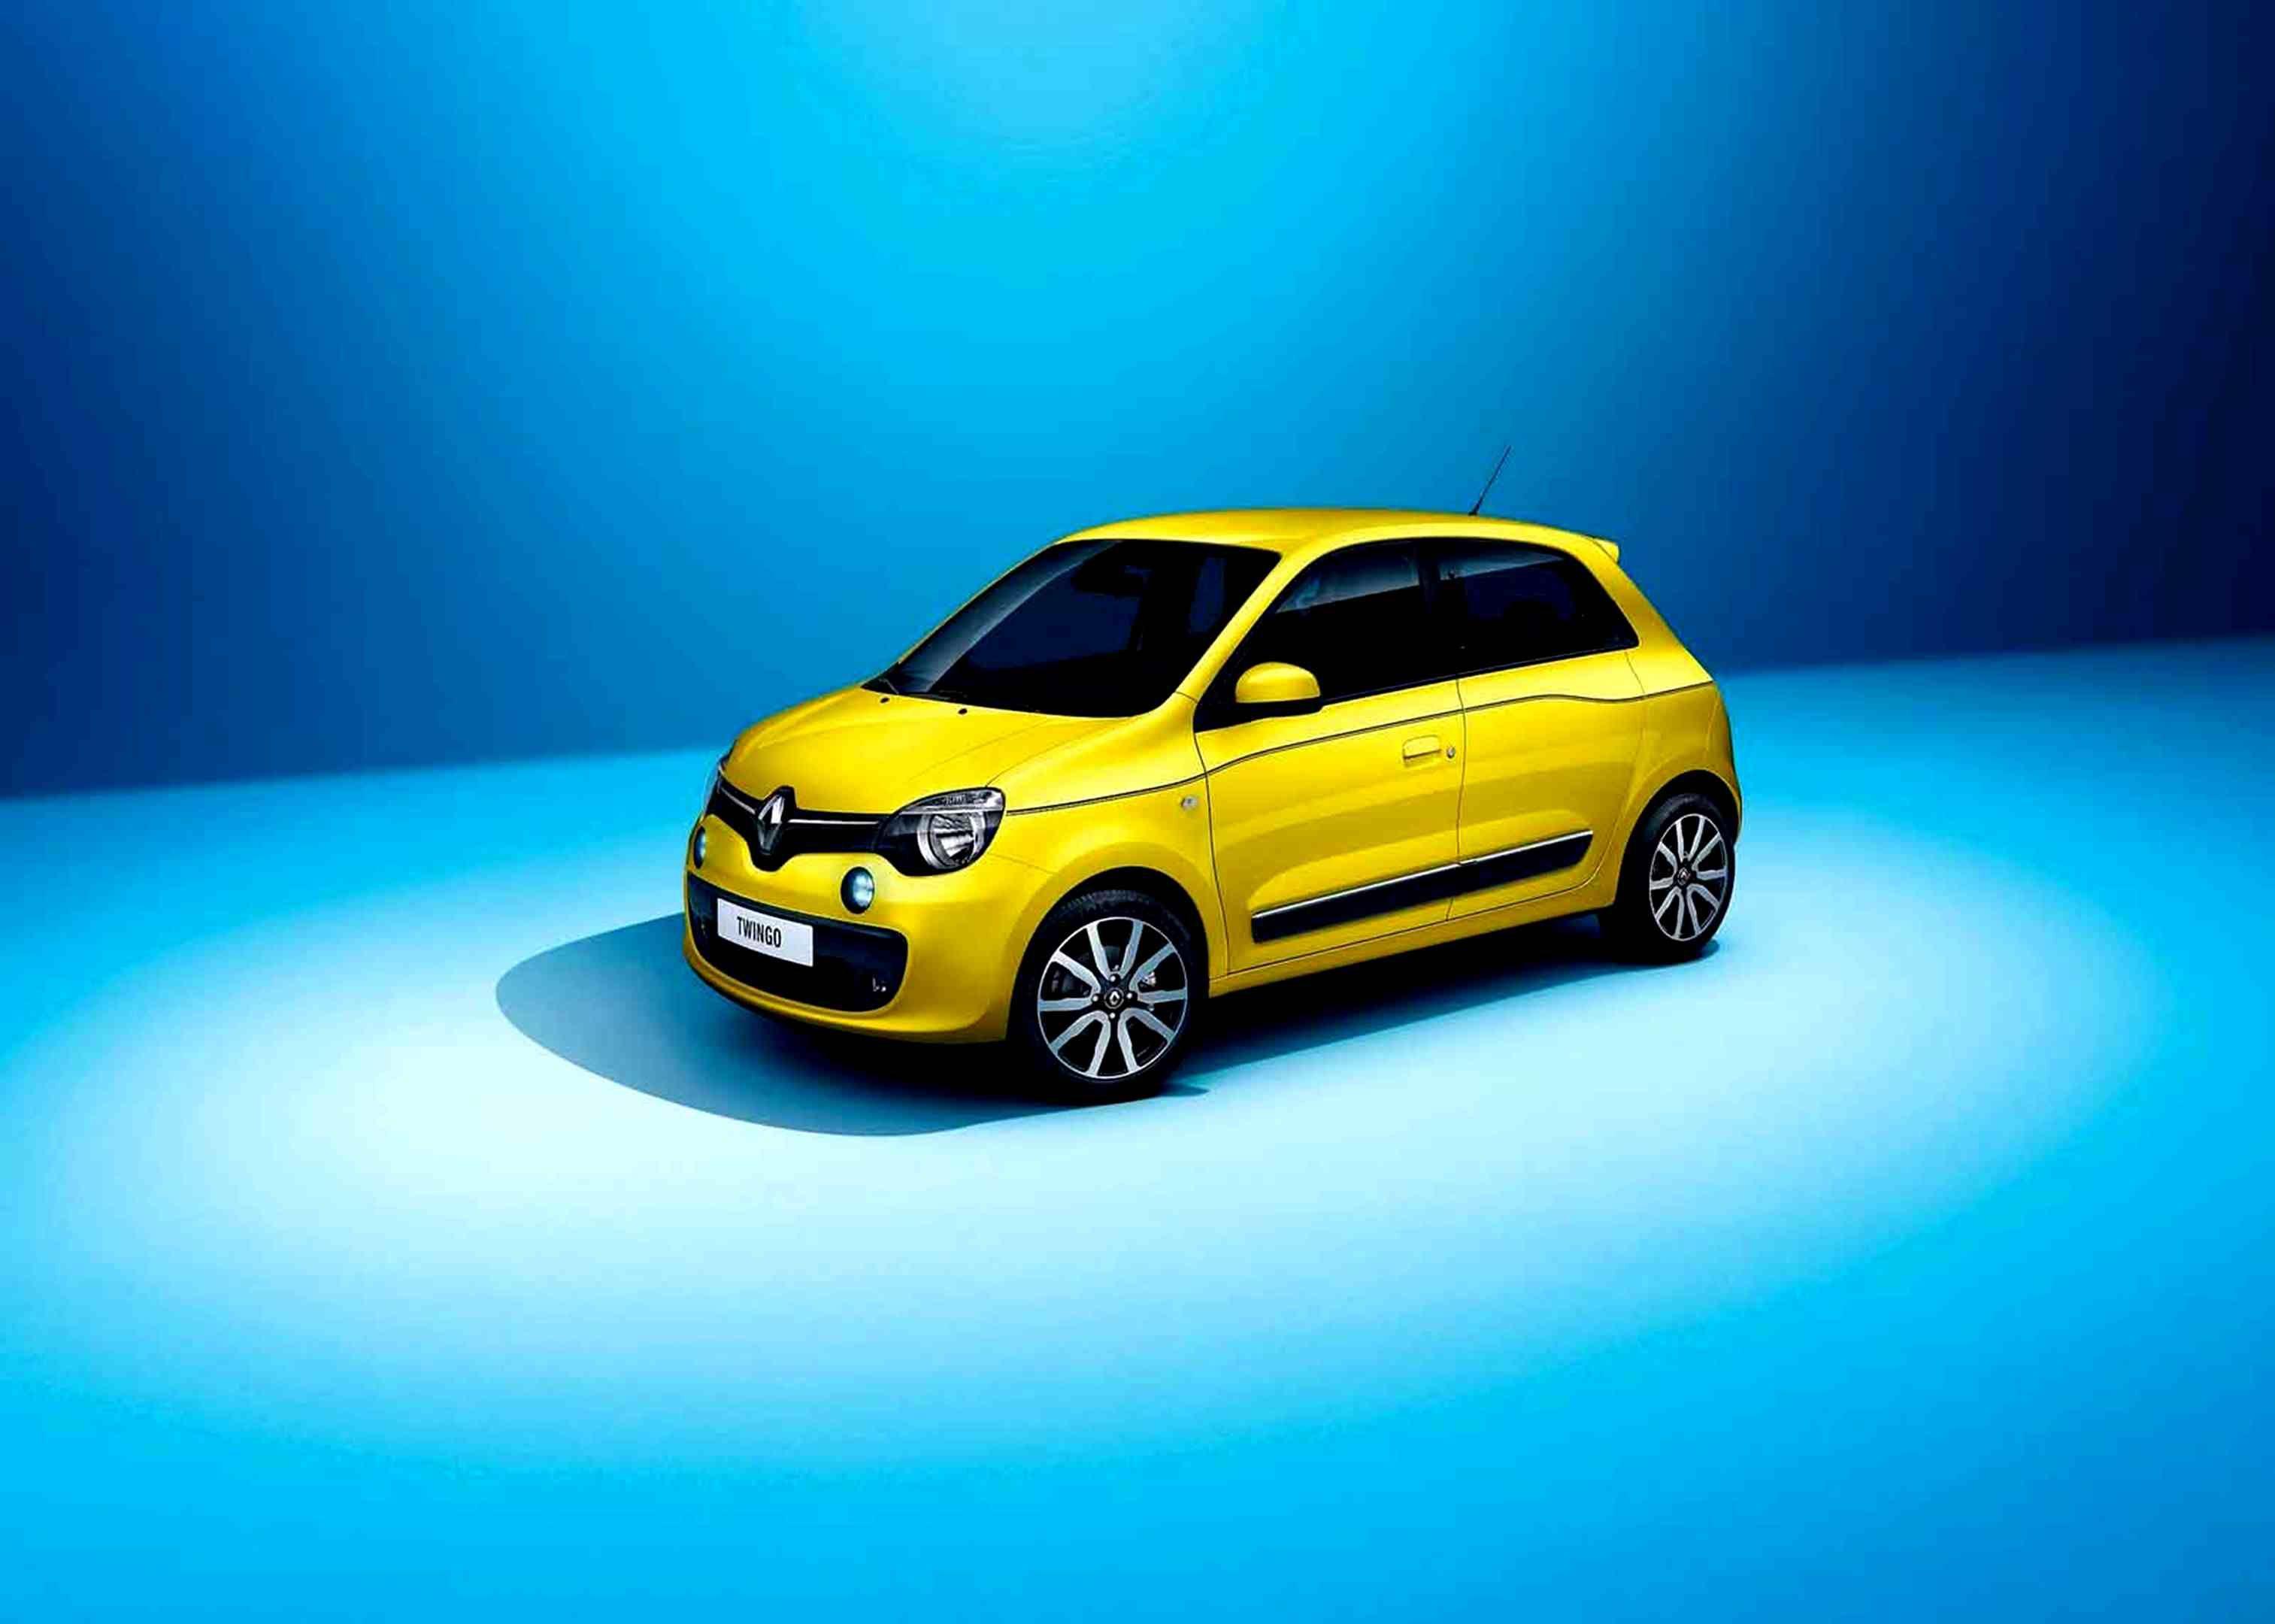 2015 Renault Twingo Wallpapers 2015 Renault Twingo Renault